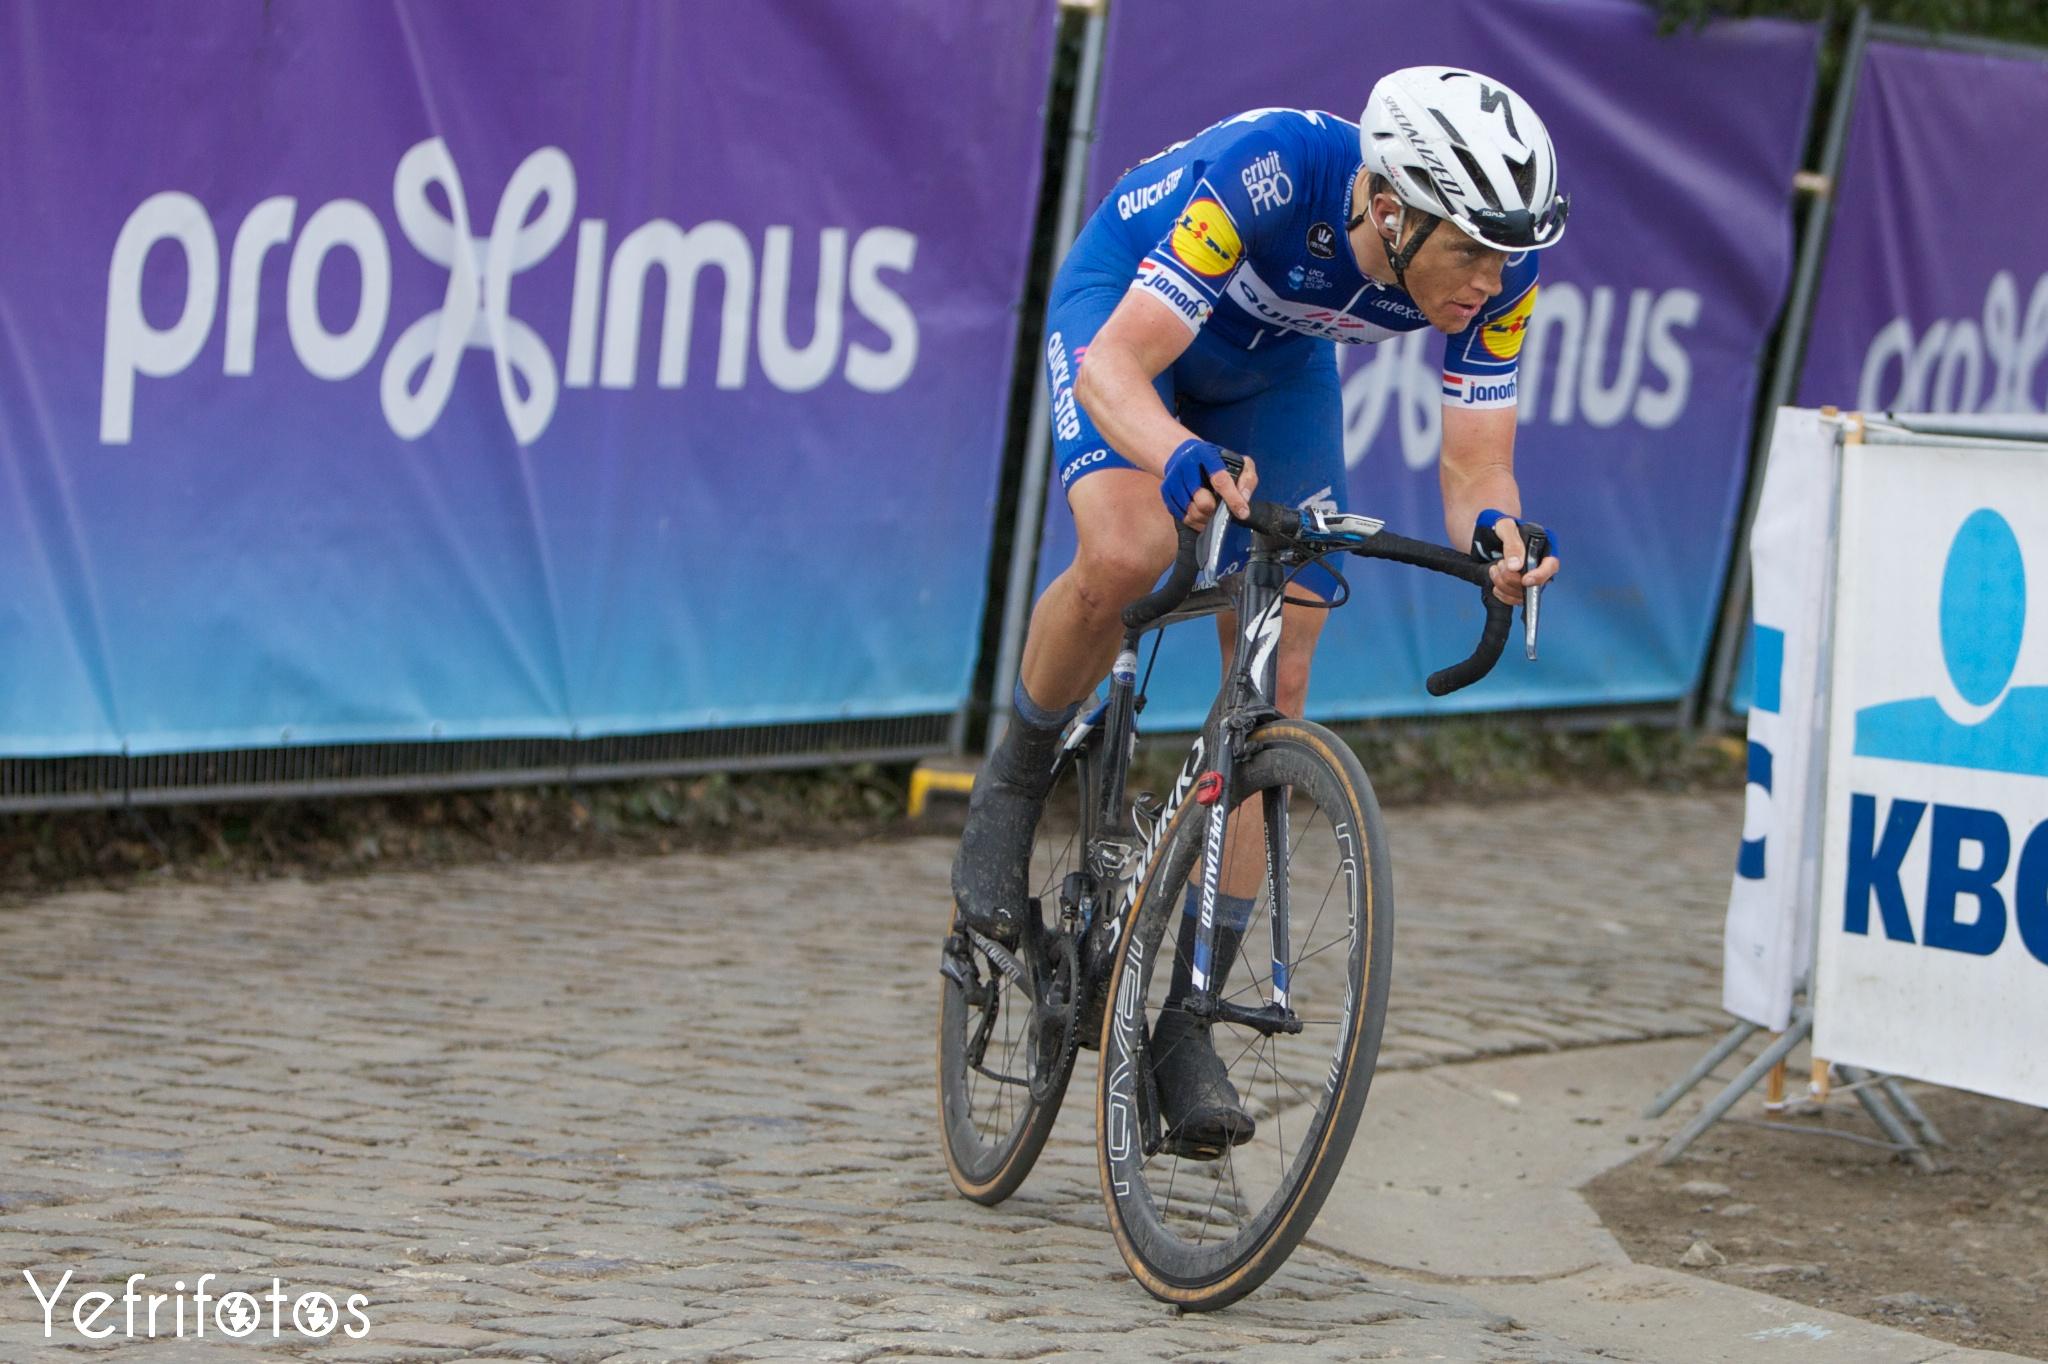 Nikki Terpstra Tour des Flandres